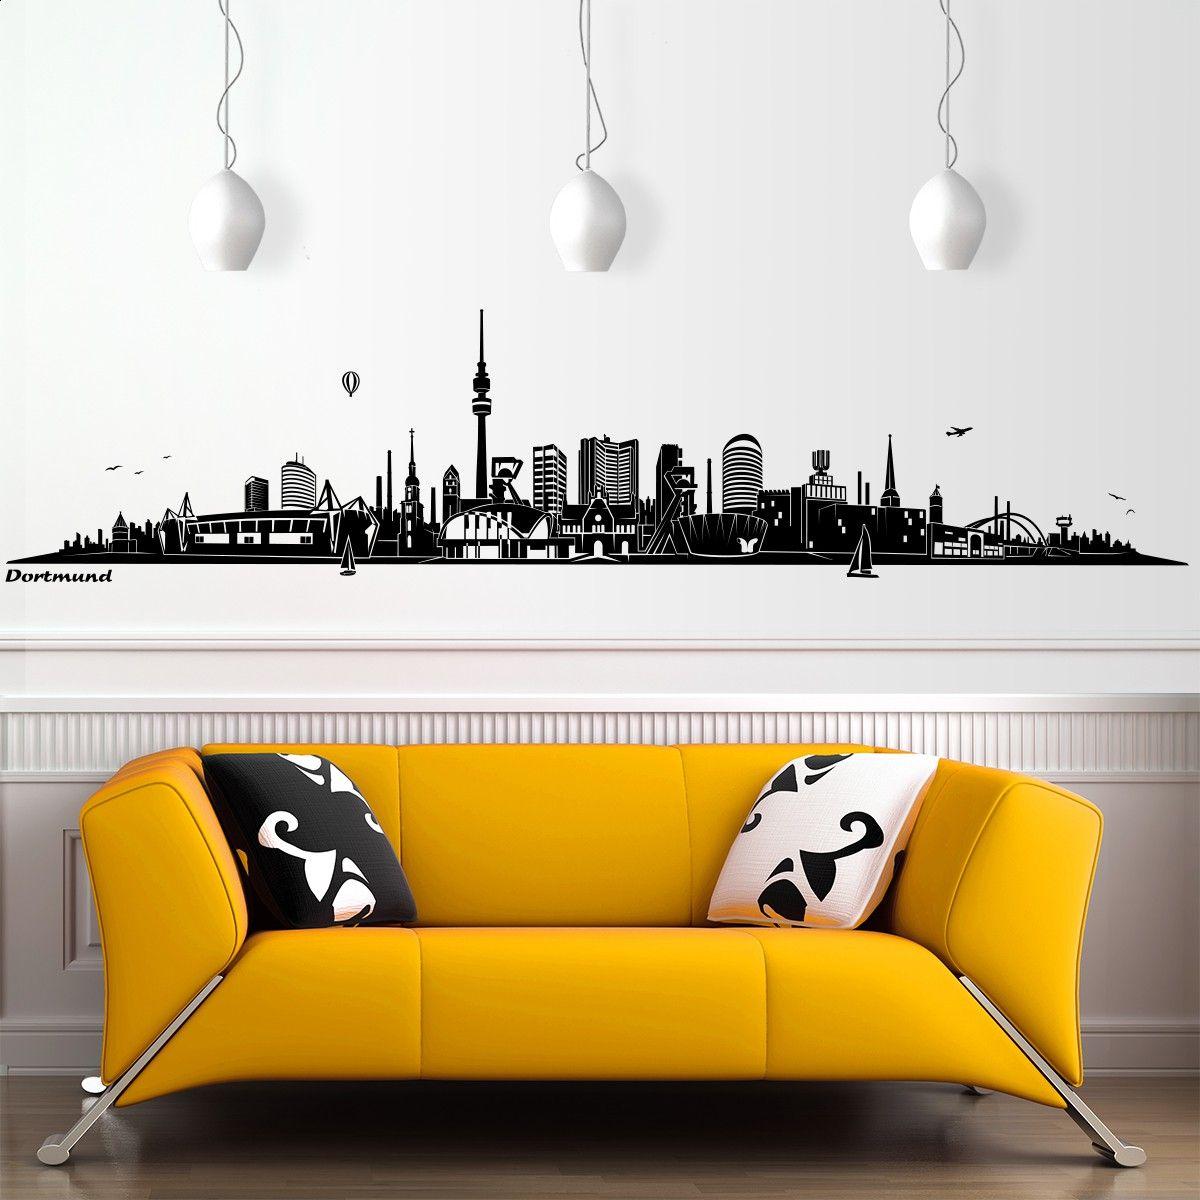 New york wandtattoo 6023 made house decor - Dusseldorf wandtattoo ...